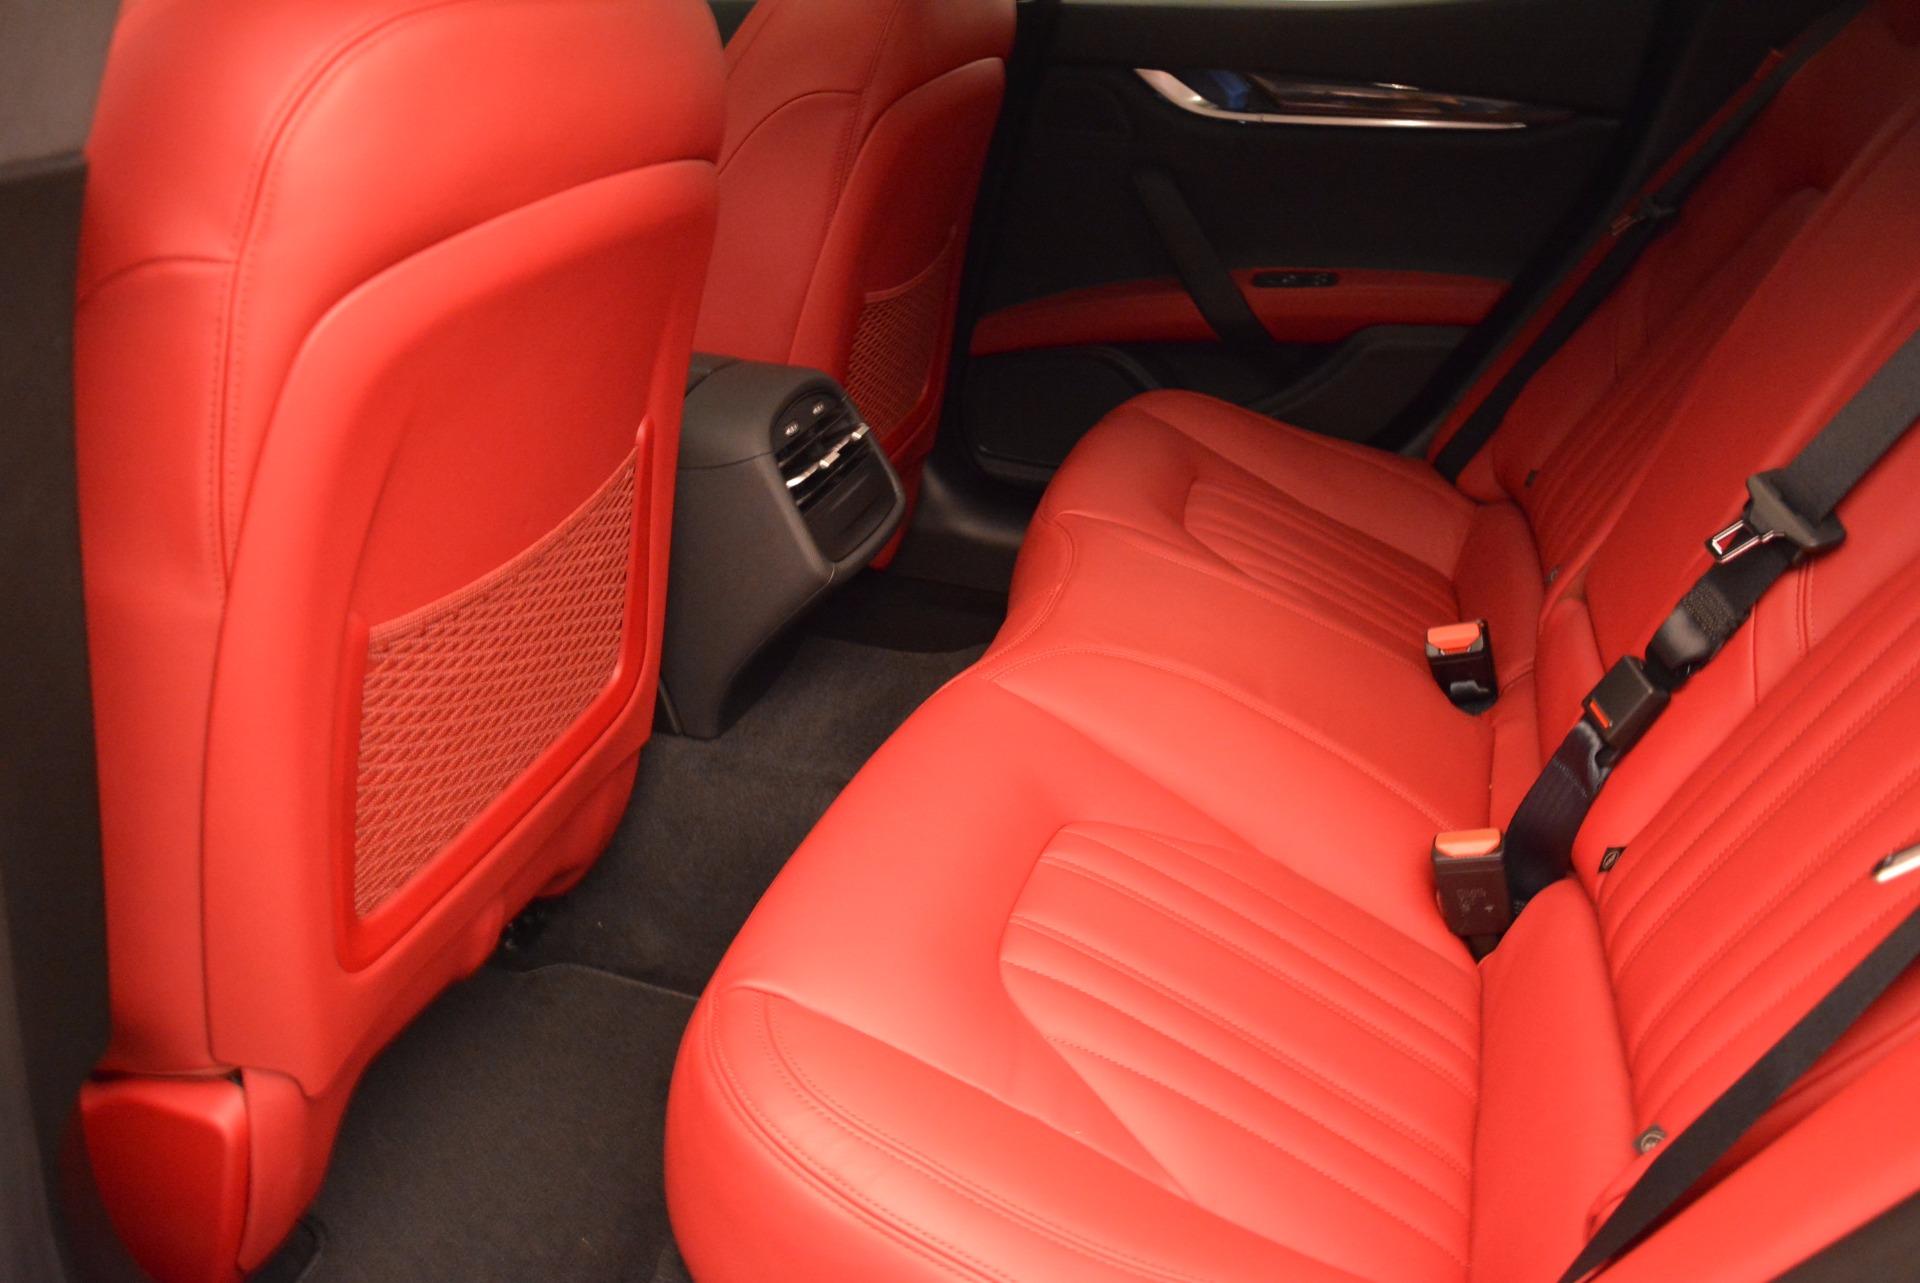 Used 2015 Maserati Ghibli S Q4 For Sale In Greenwich, CT 1290_p18